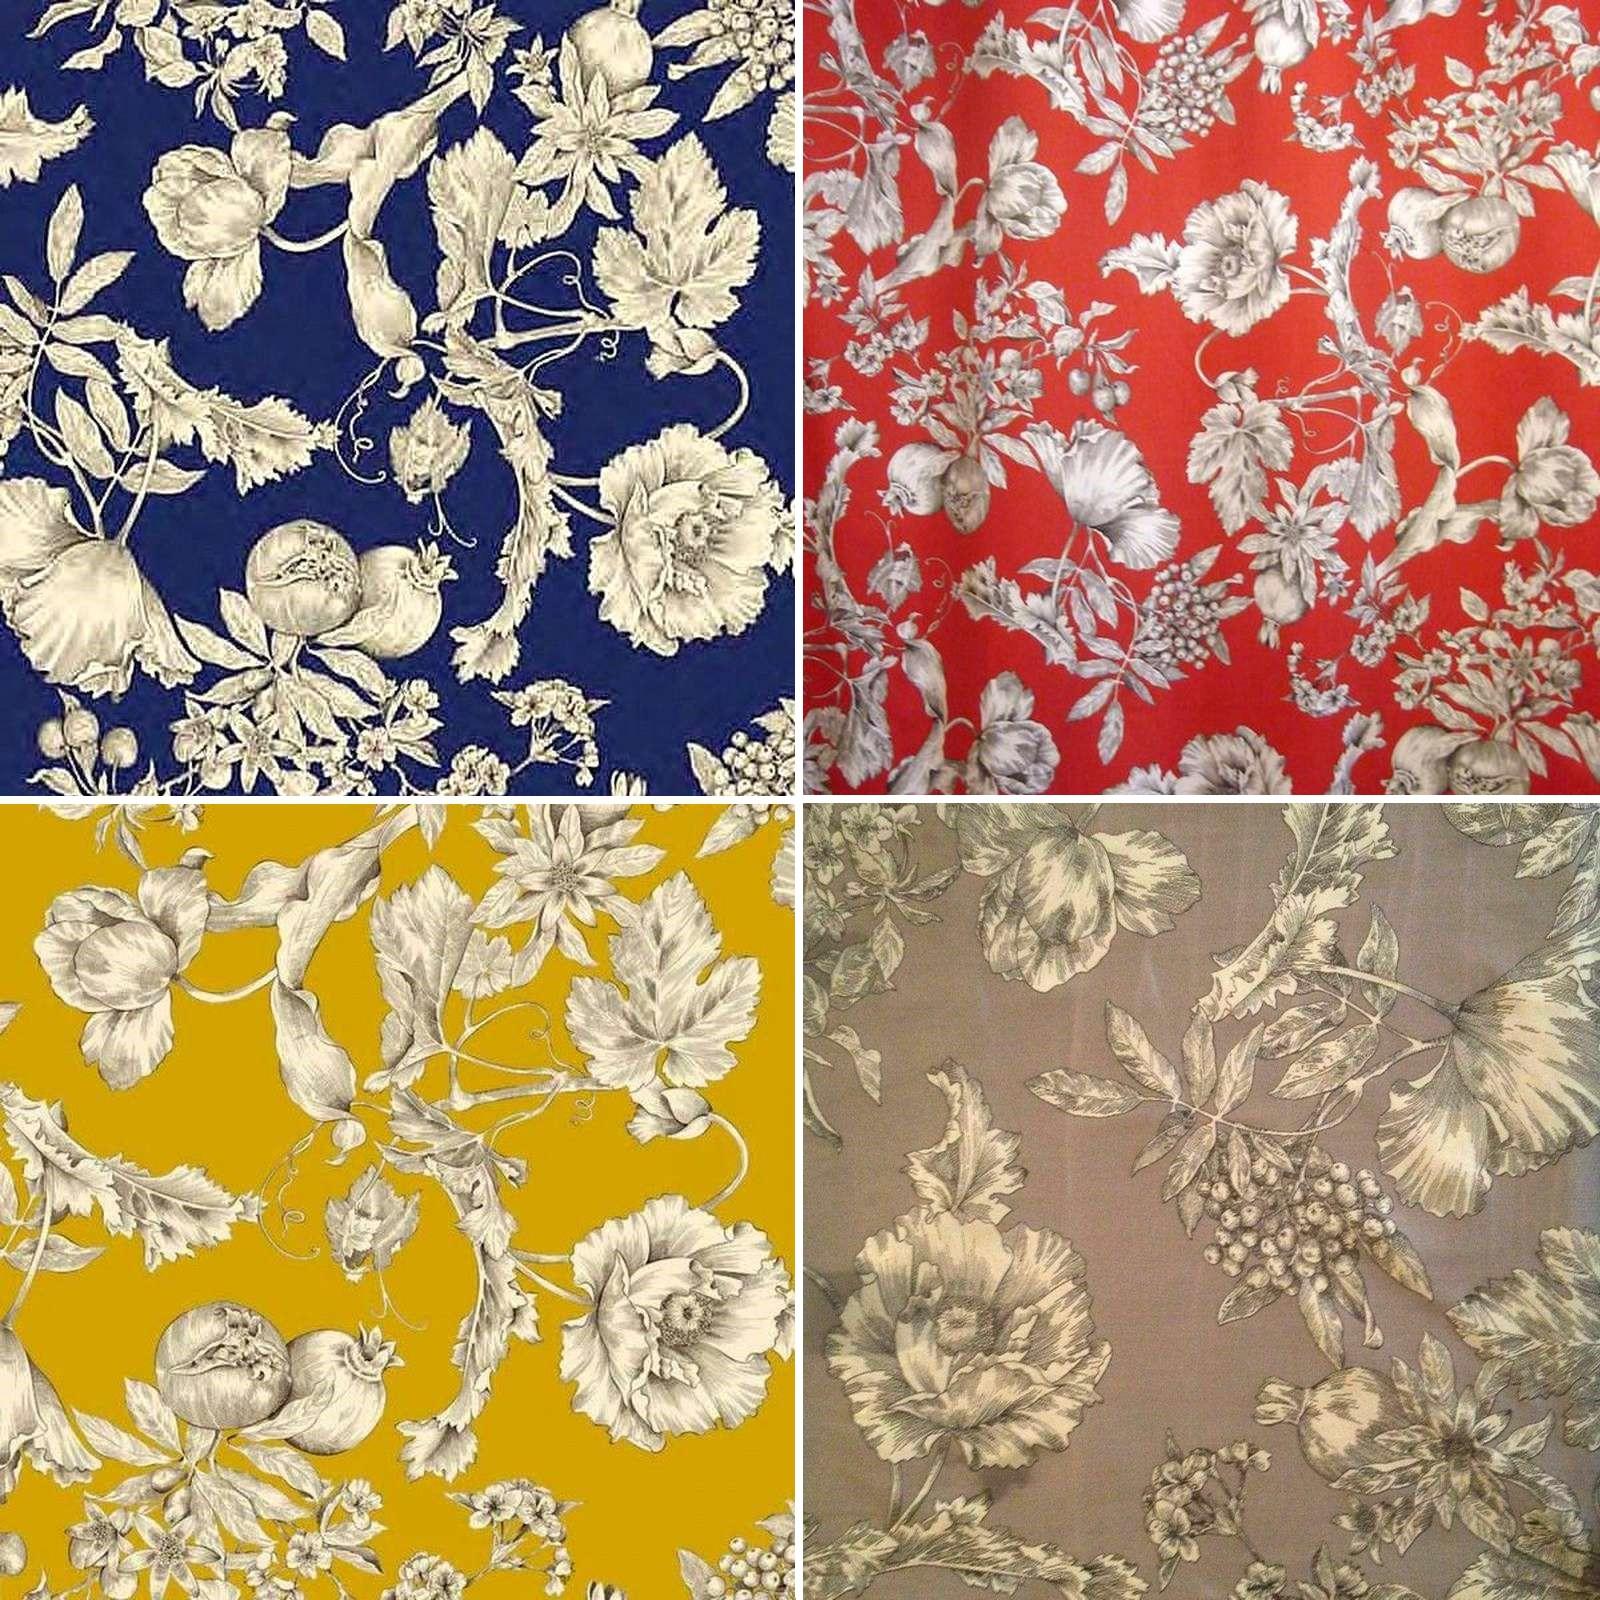 tissu satin en gros les grenades motif fleuri thevenon. Black Bedroom Furniture Sets. Home Design Ideas